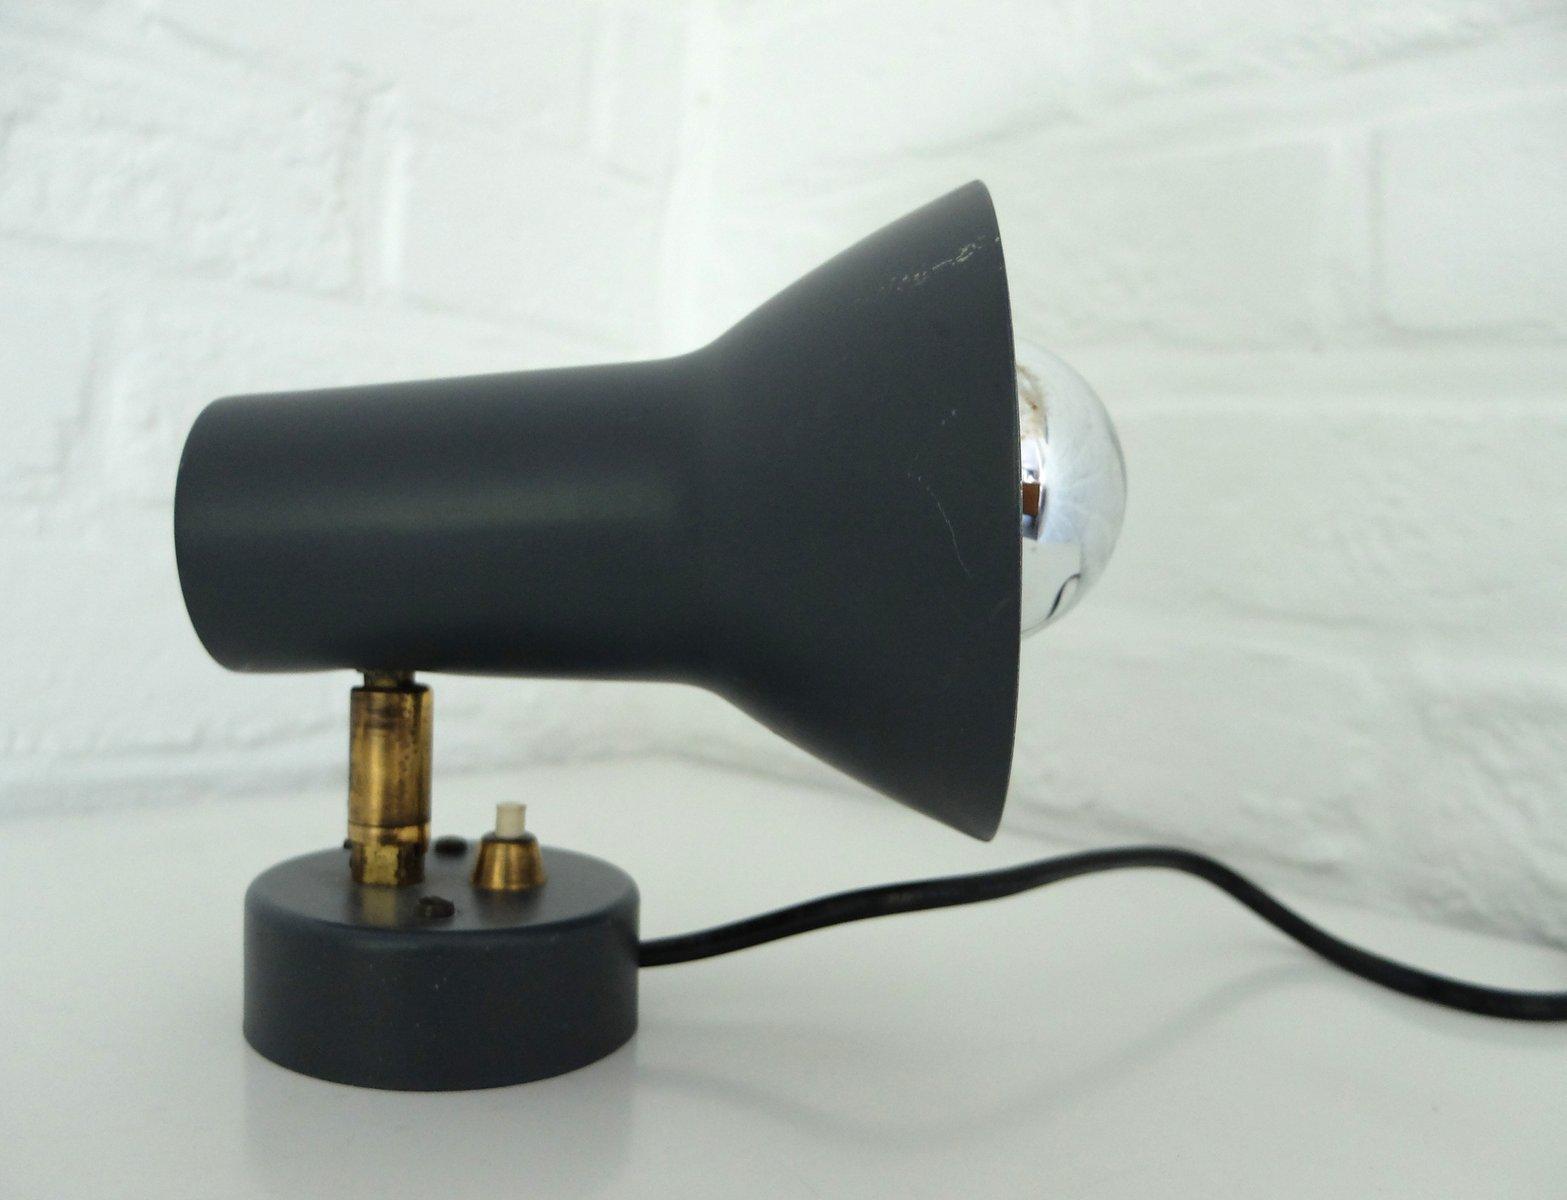 dunkelgraue skandinavische mid century wandlampe von nordisk solar bei pamono kaufen. Black Bedroom Furniture Sets. Home Design Ideas